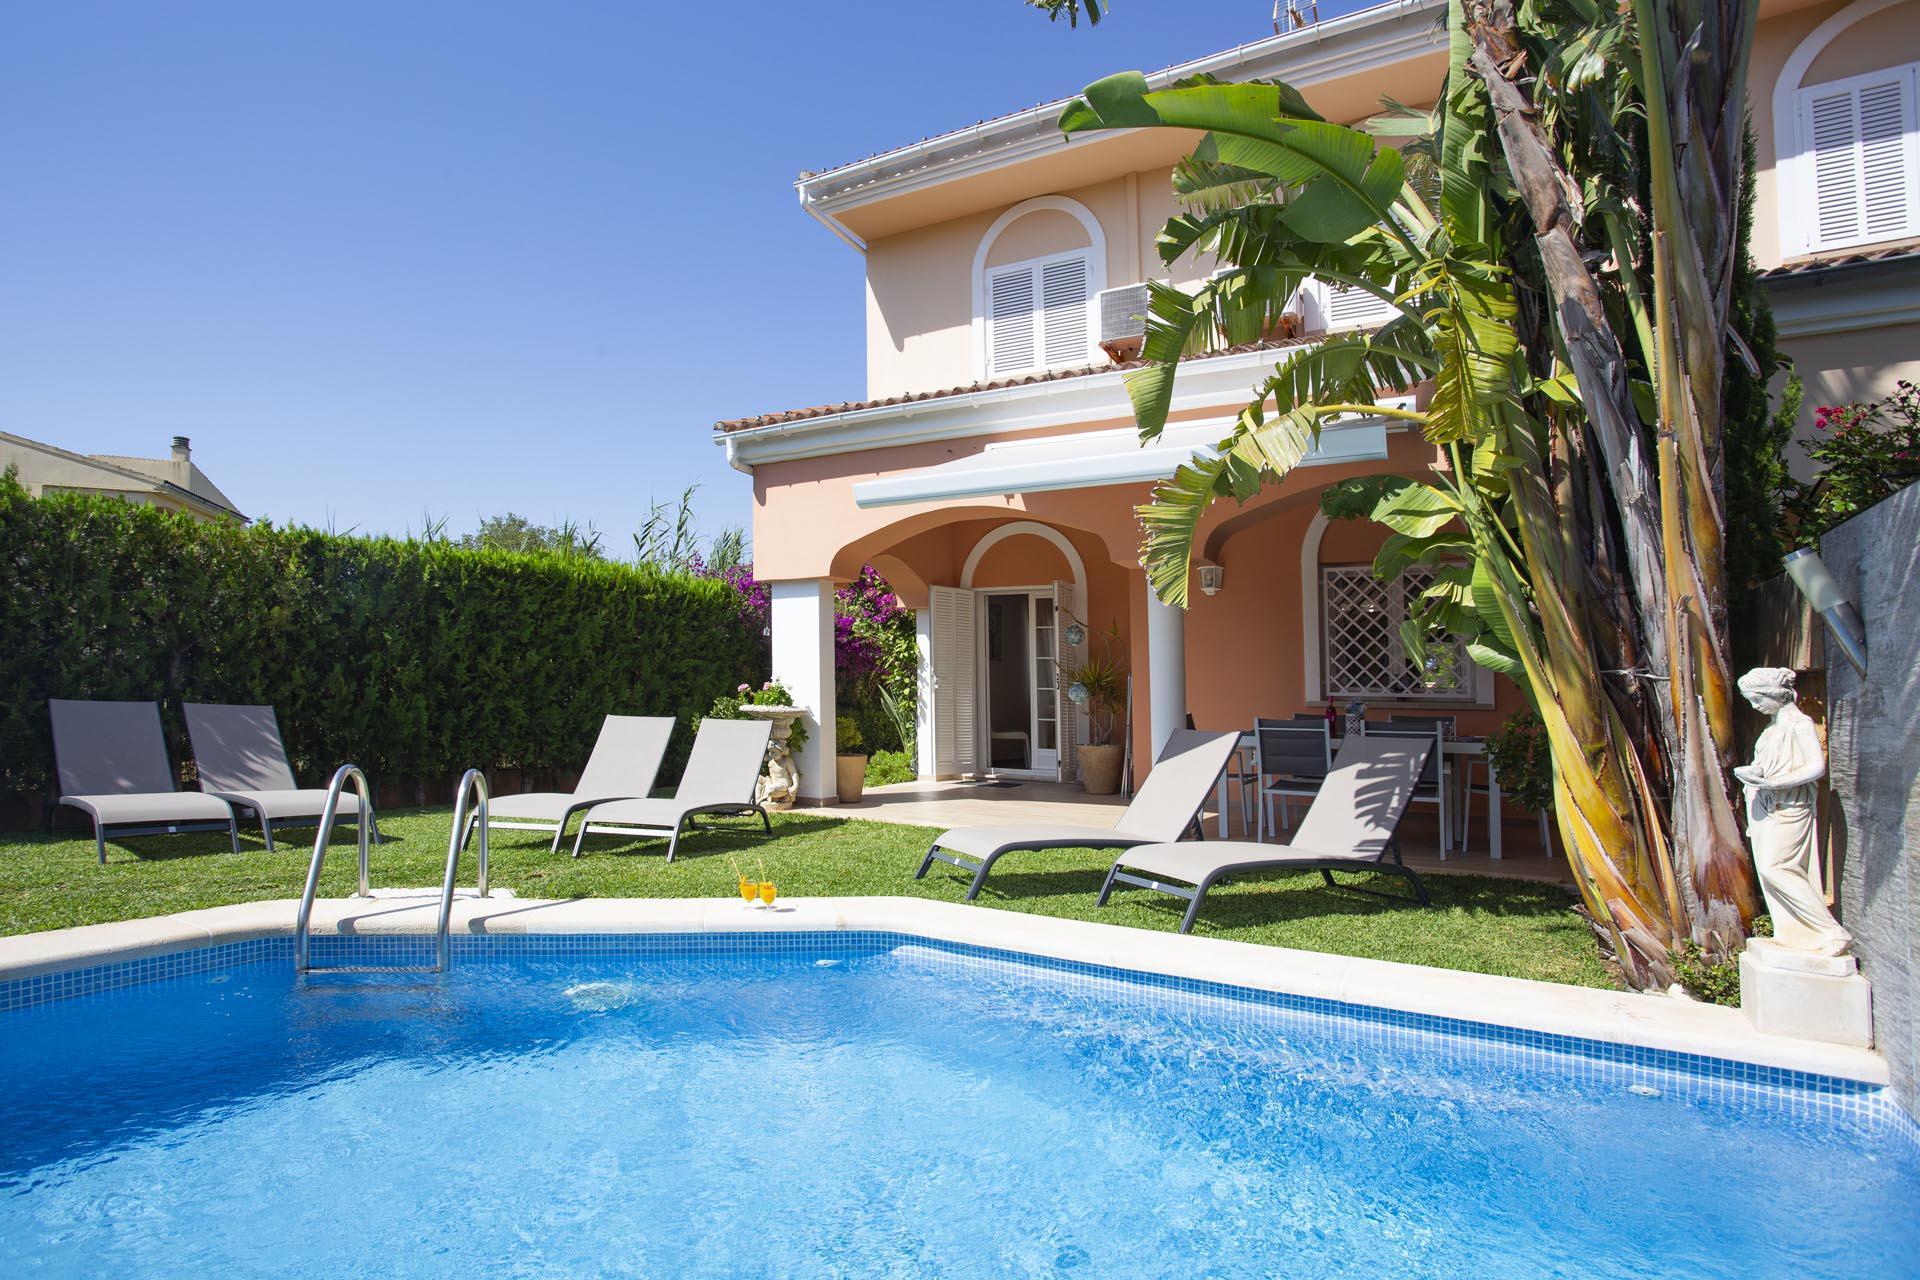 Doppelhaushälfte -                                       Playa De Muro -                                       3 Schlafzimmer -                                       6 Personen